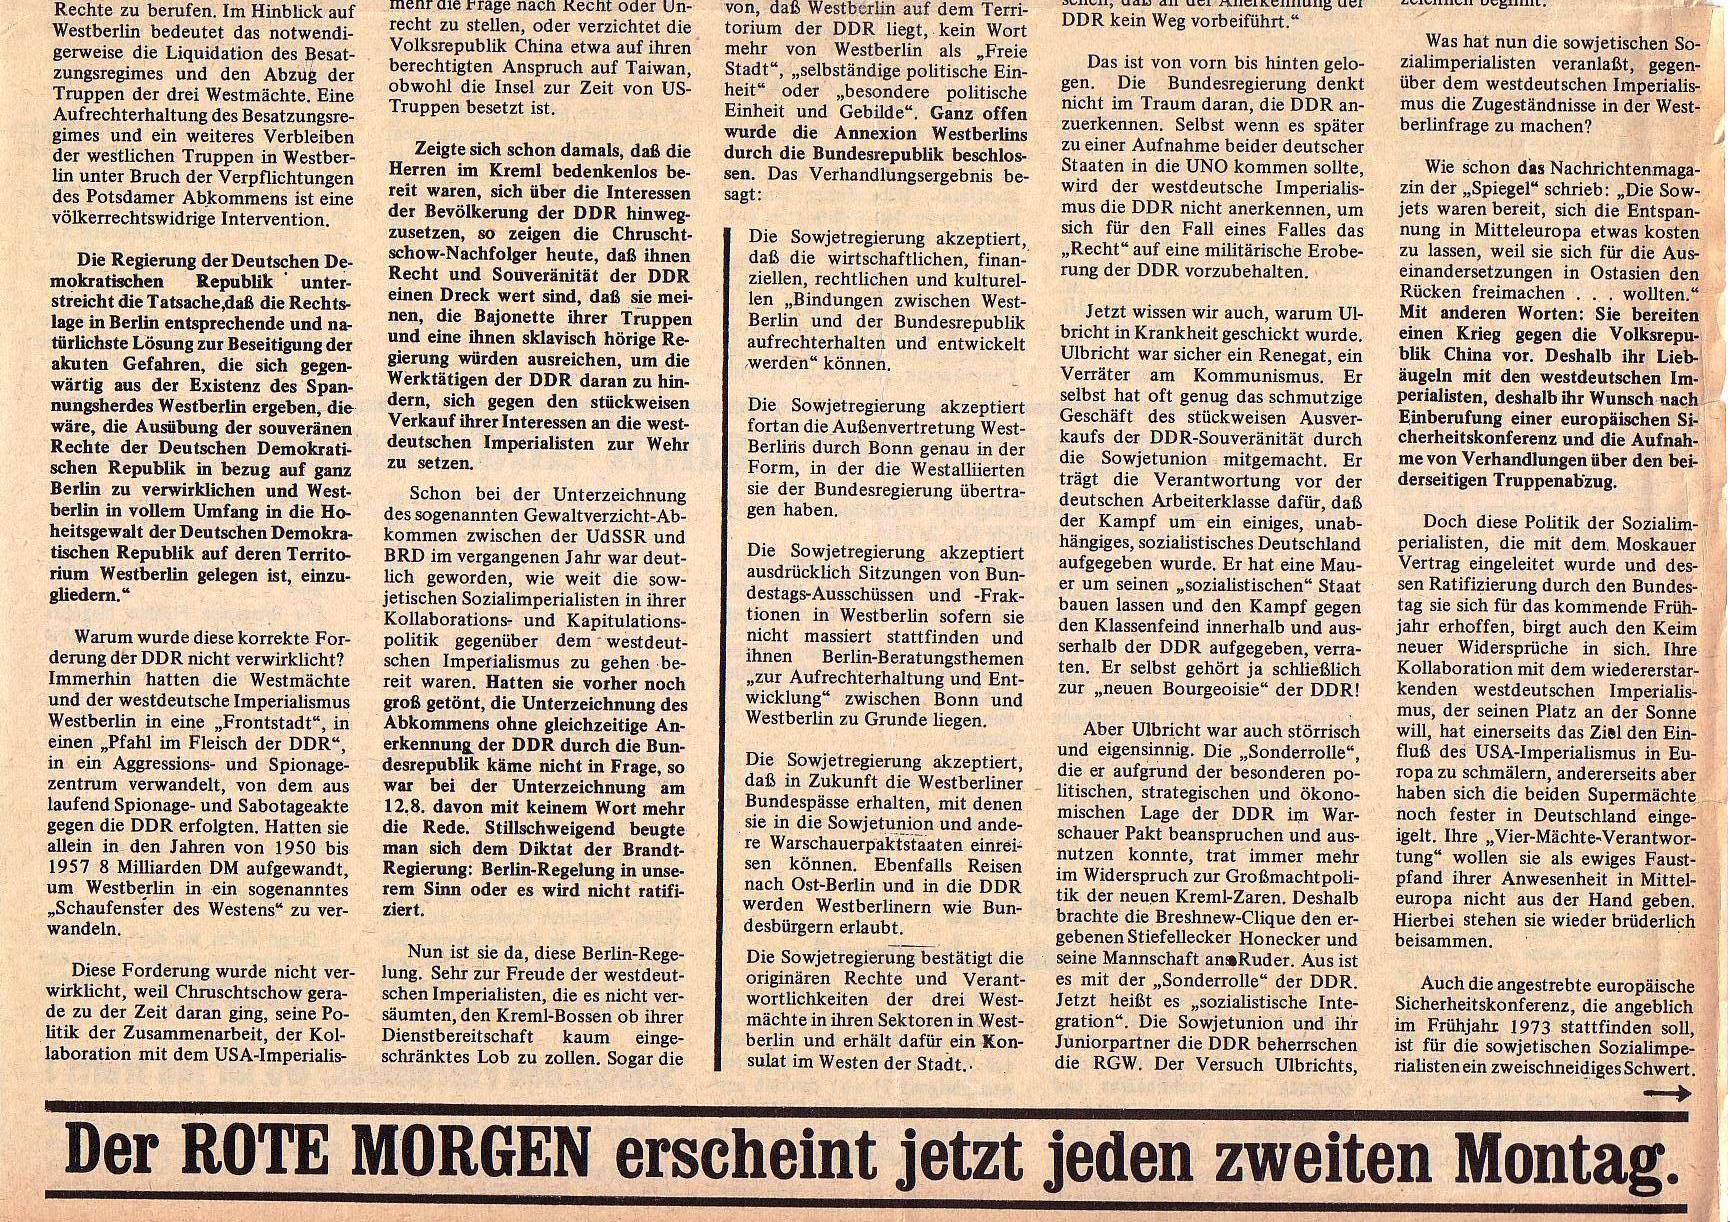 Roter Morgen, 5. Jg., 13. September 1971, Nr. 9, Seite 3b